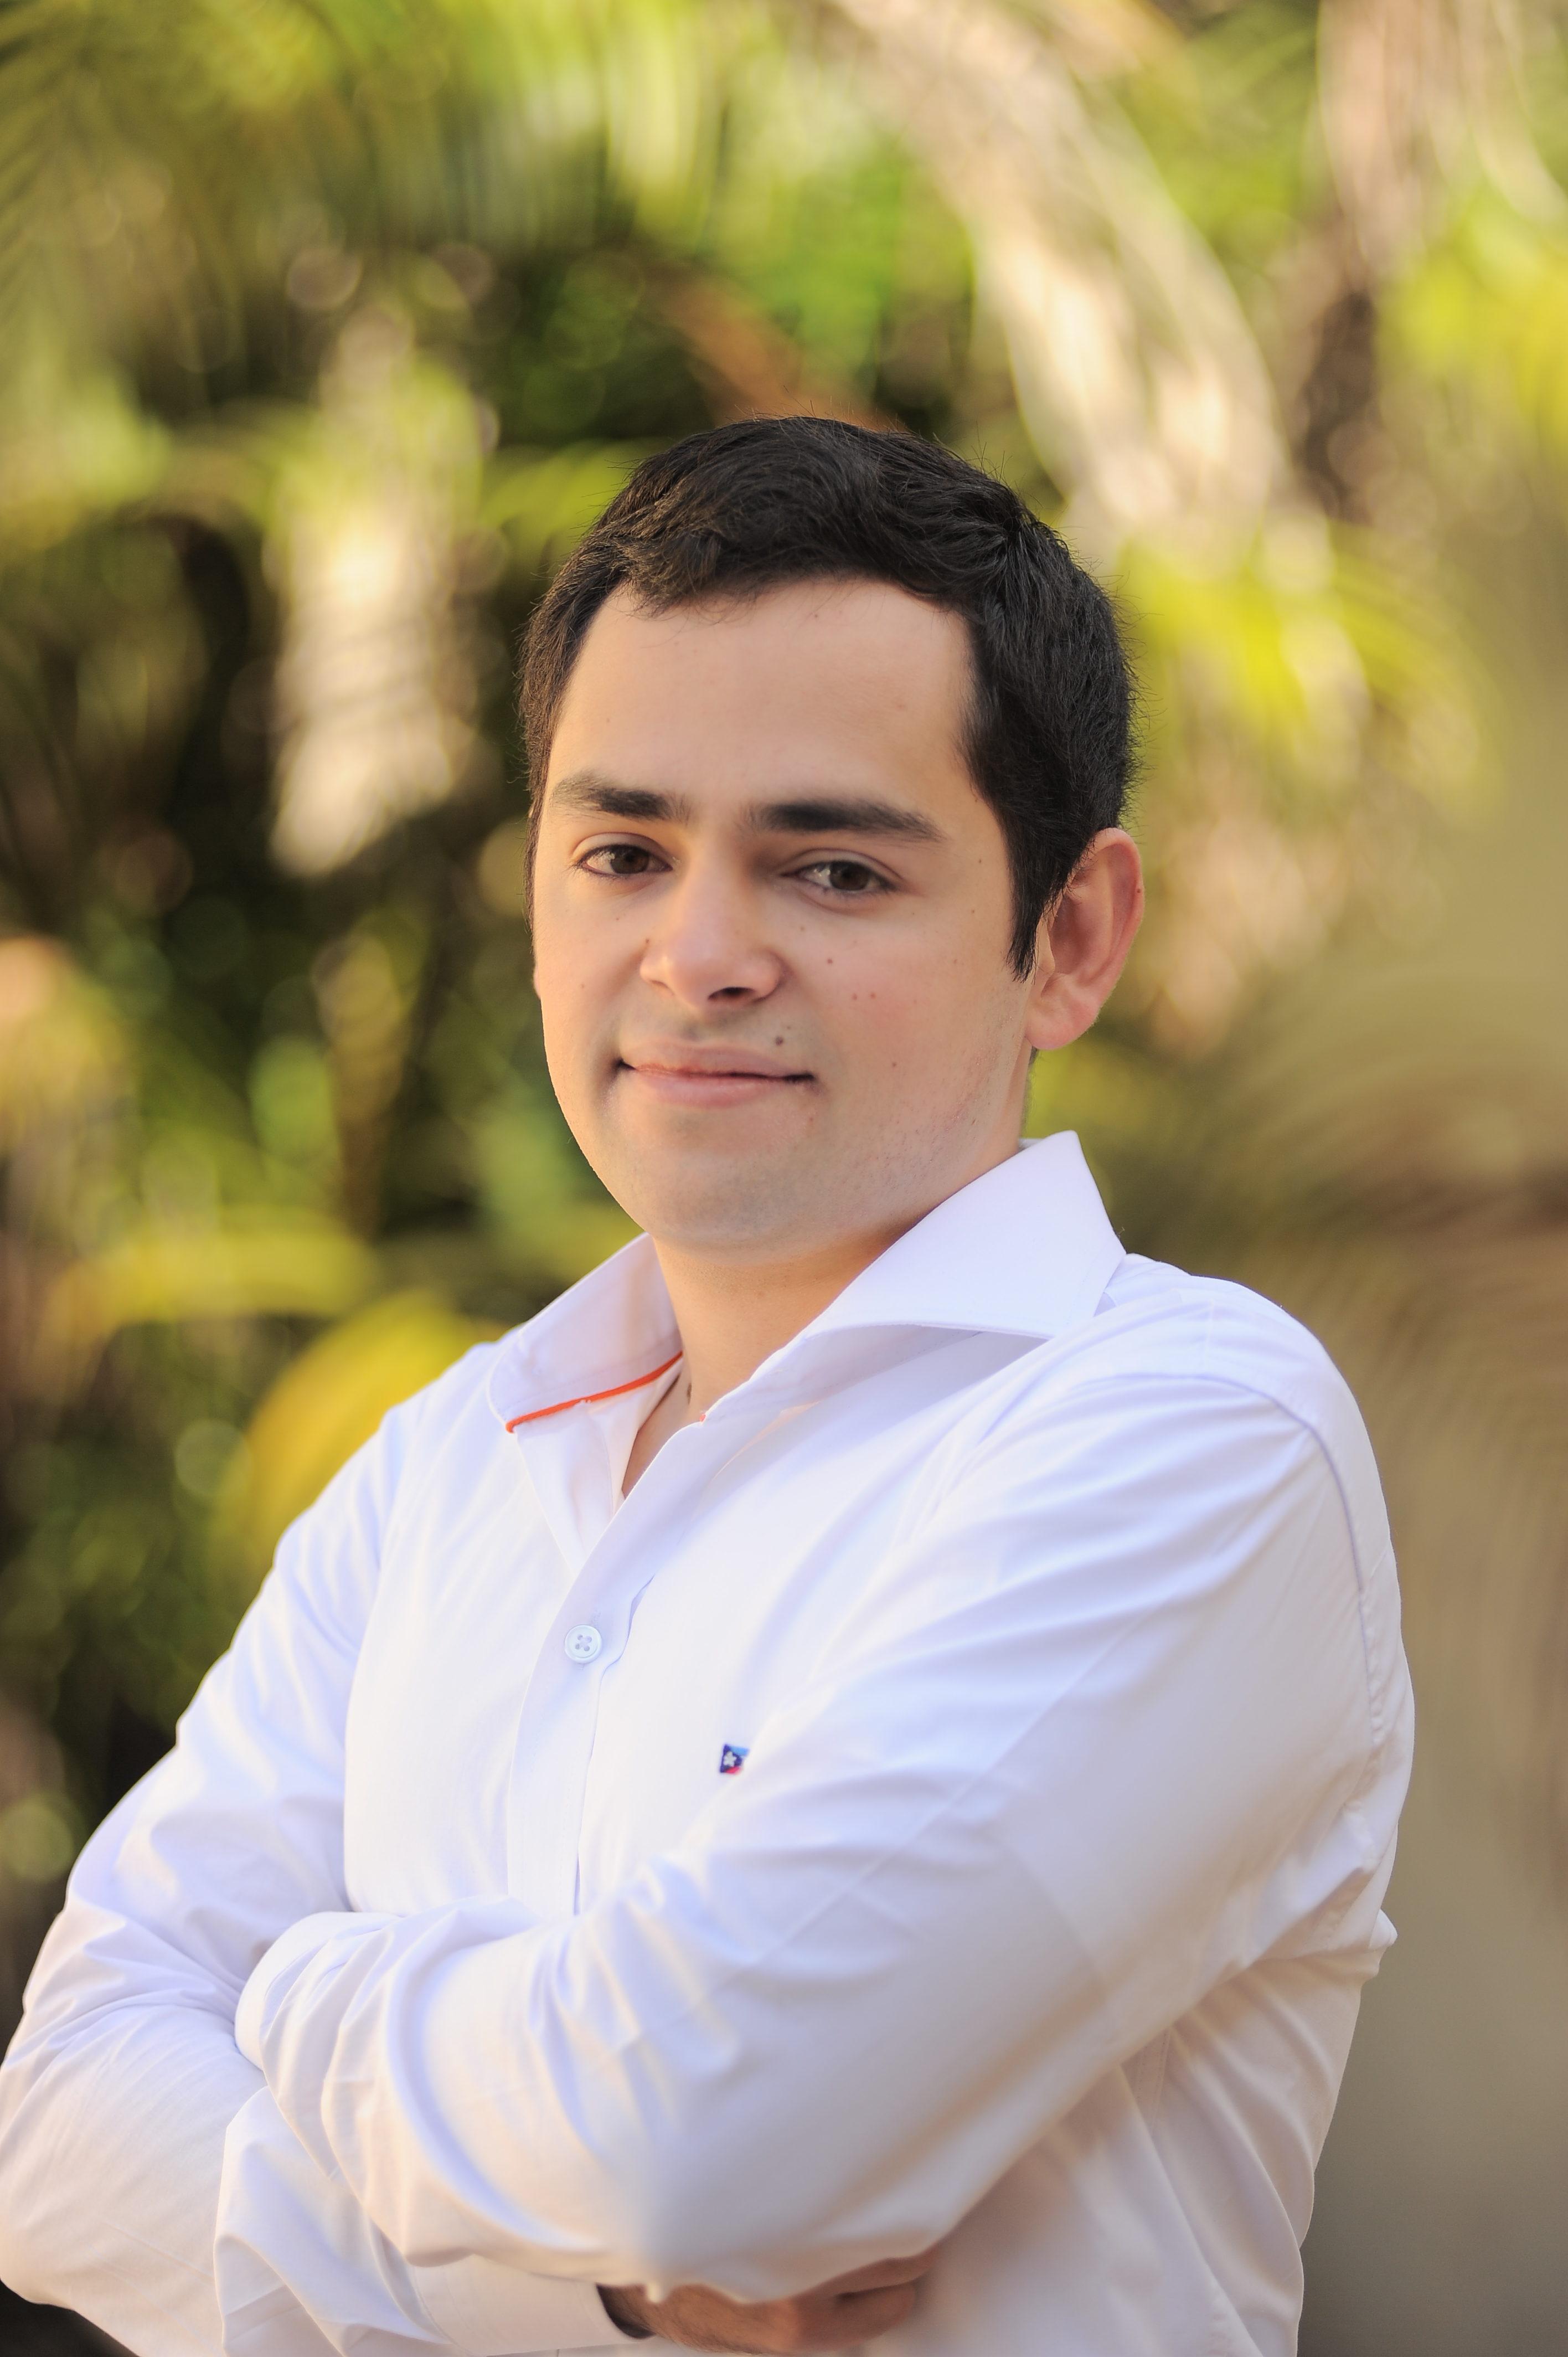 ENTREVISTA: Afonso Luís Souza Faria - Aprovado em 16º lugar no concurso SEFAZ GO para o cargo de Auditor Fiscal da Receita Estadual